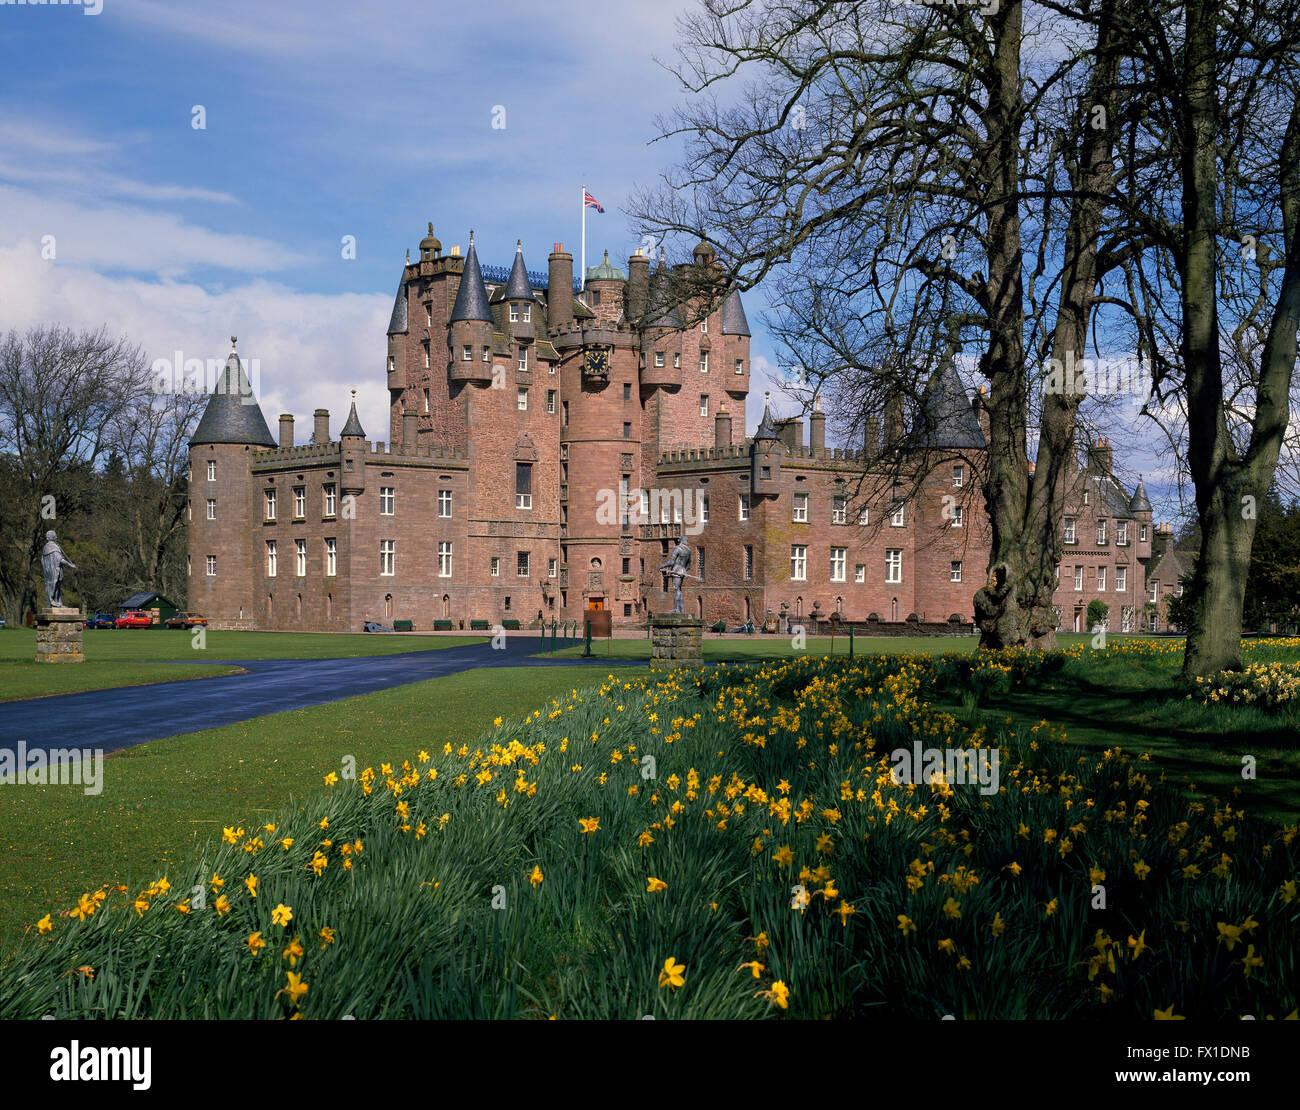 Glamis Castle Angus Scotland United Kingdom - Stock Image